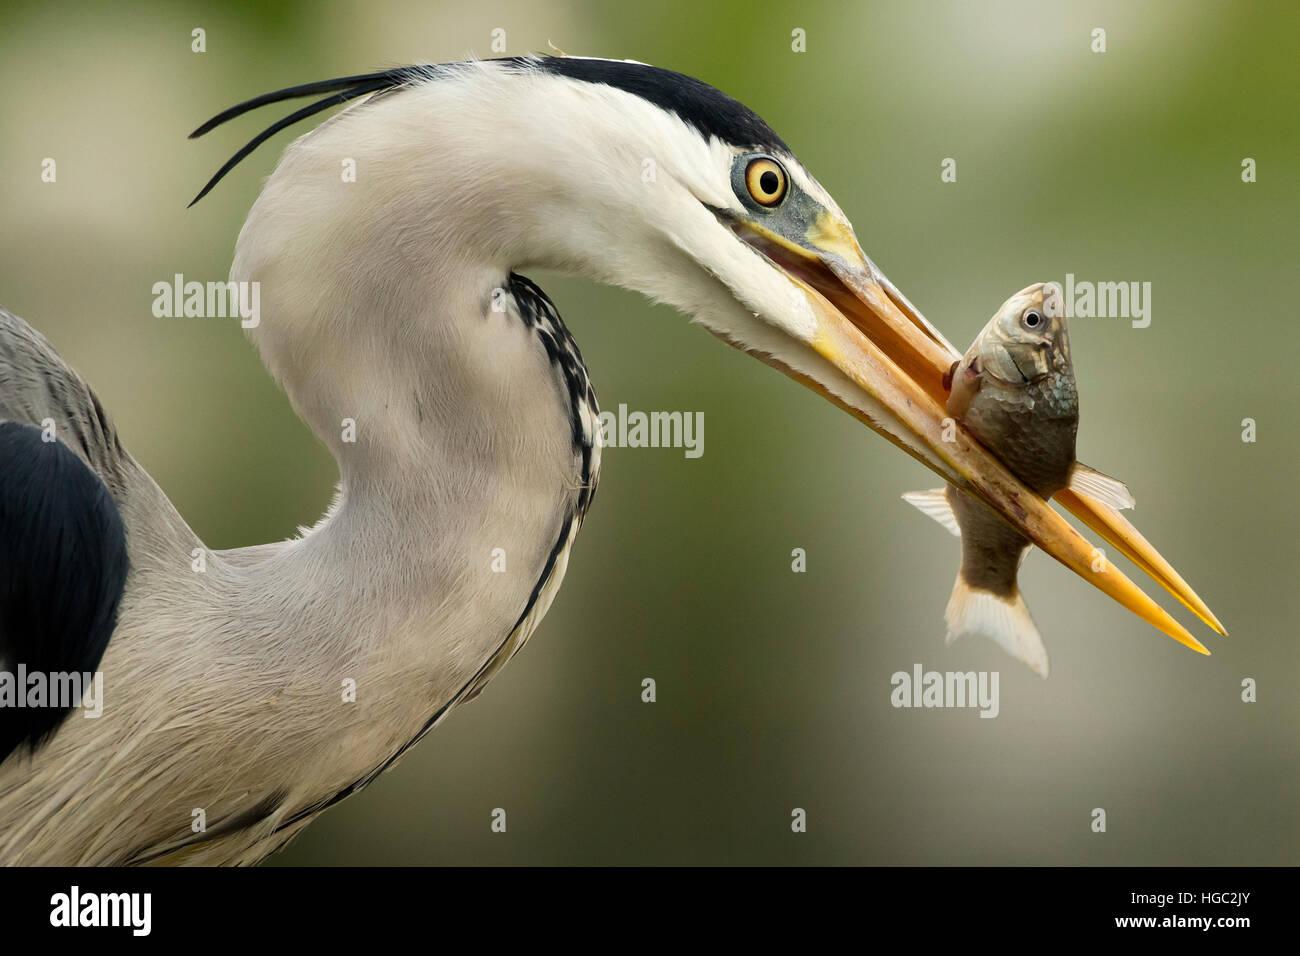 Airone cinerino (Ardea cinerea) pescare un pesce Immagini Stock